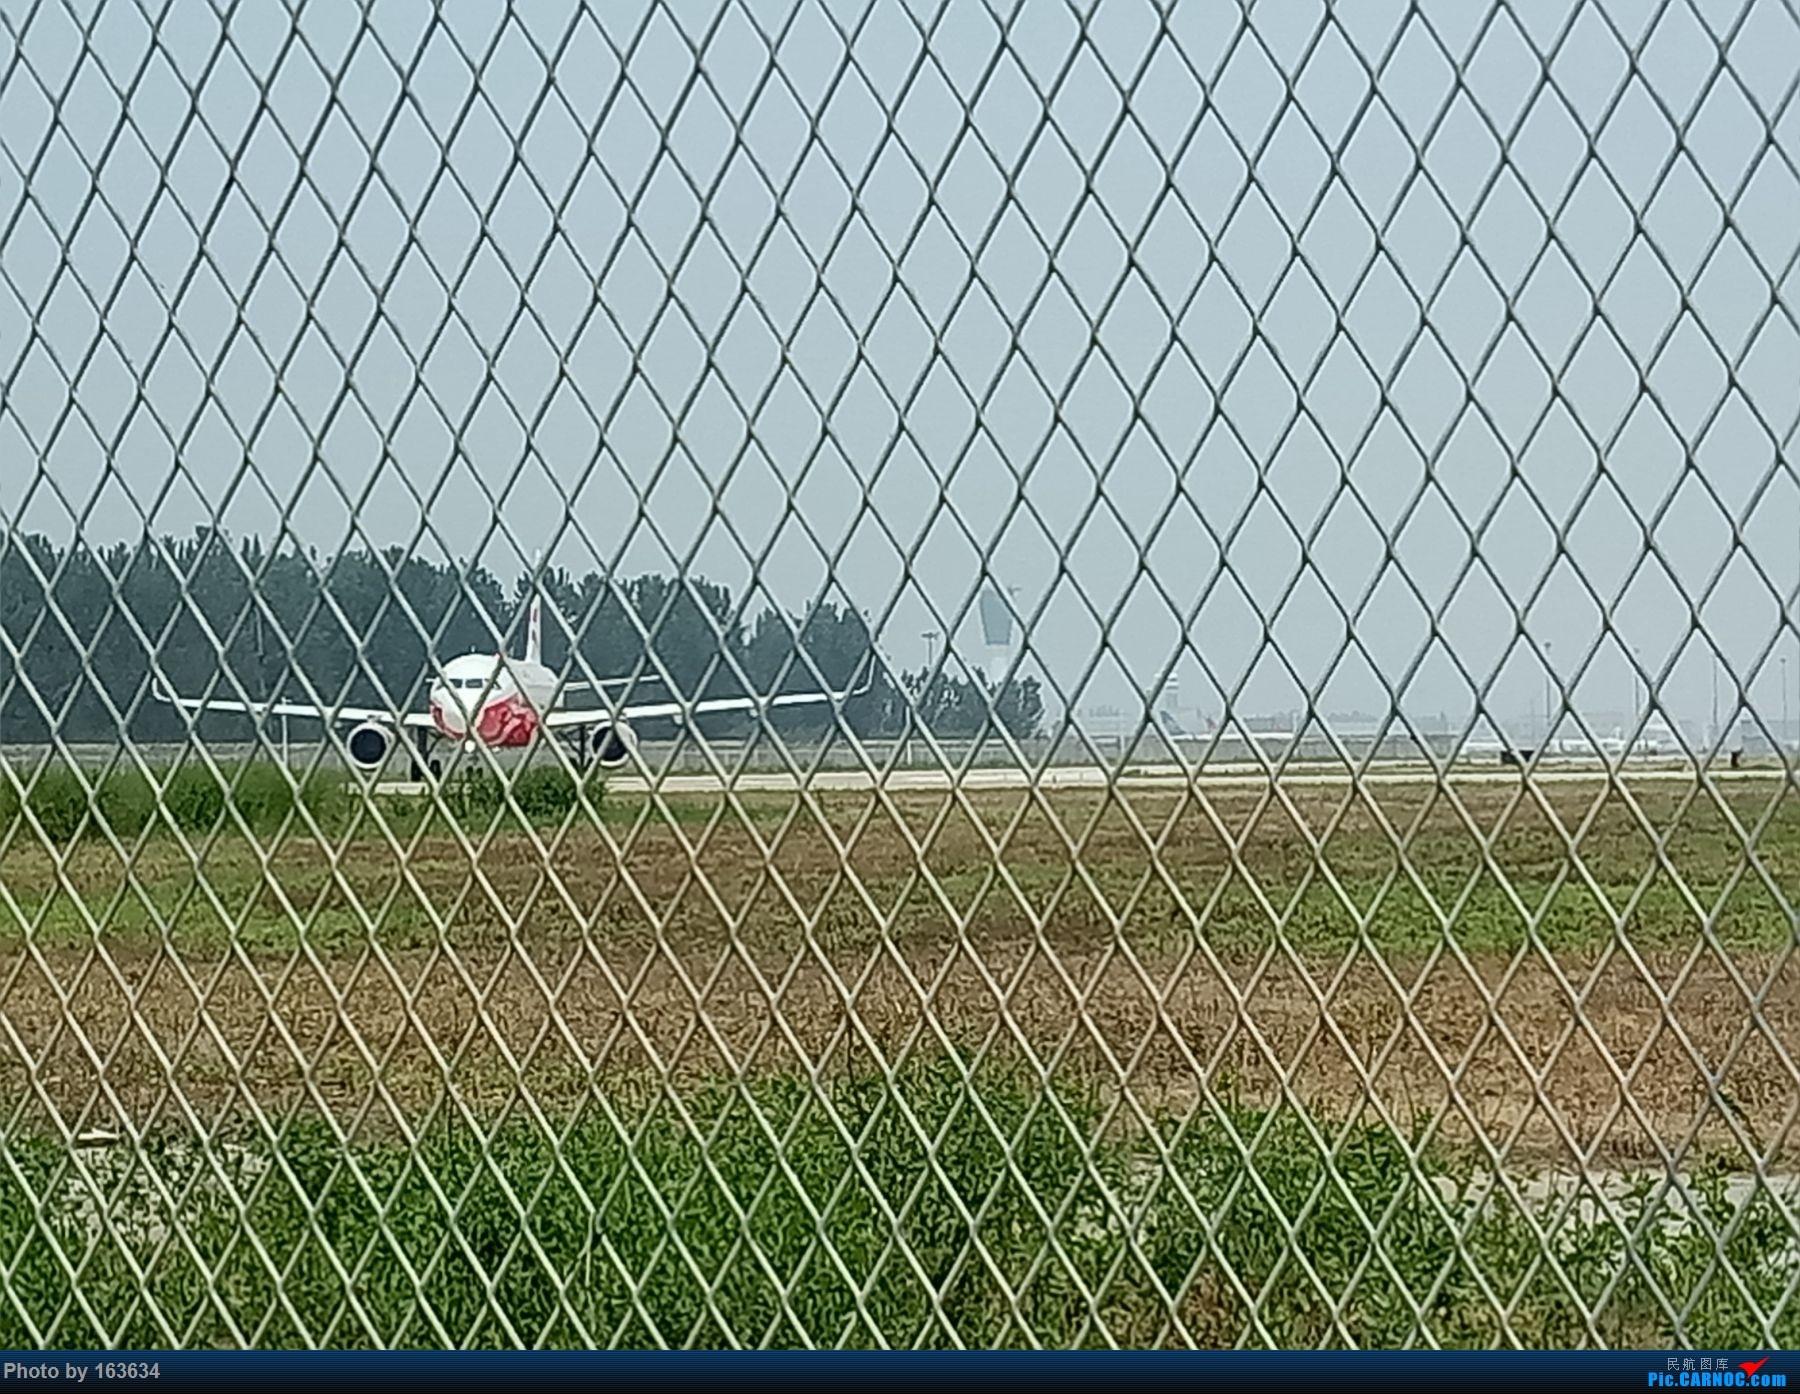 Re:[原创]第九次济南拍机。。。(对不起大家,上海的图还没来得及处理,大家先看看济南的吧) AIRBUS A320-200  TNA